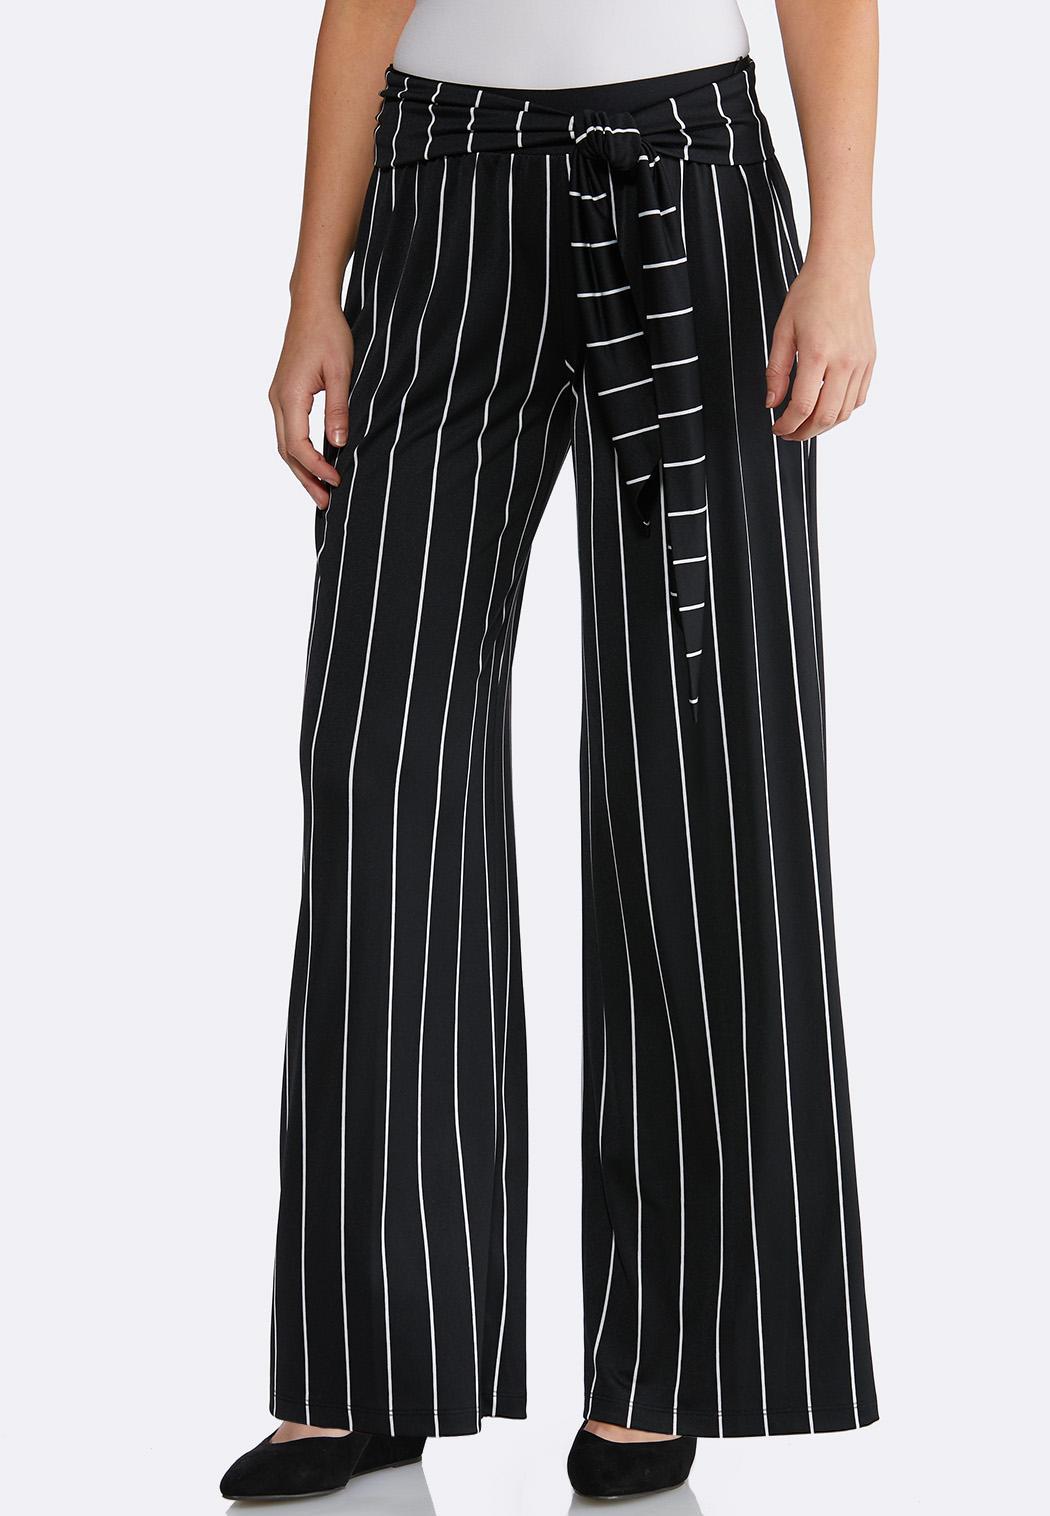 9e545cd5eb9 Petite Stripe Belted Palazzo Pants Petite Pants Cato Fashions